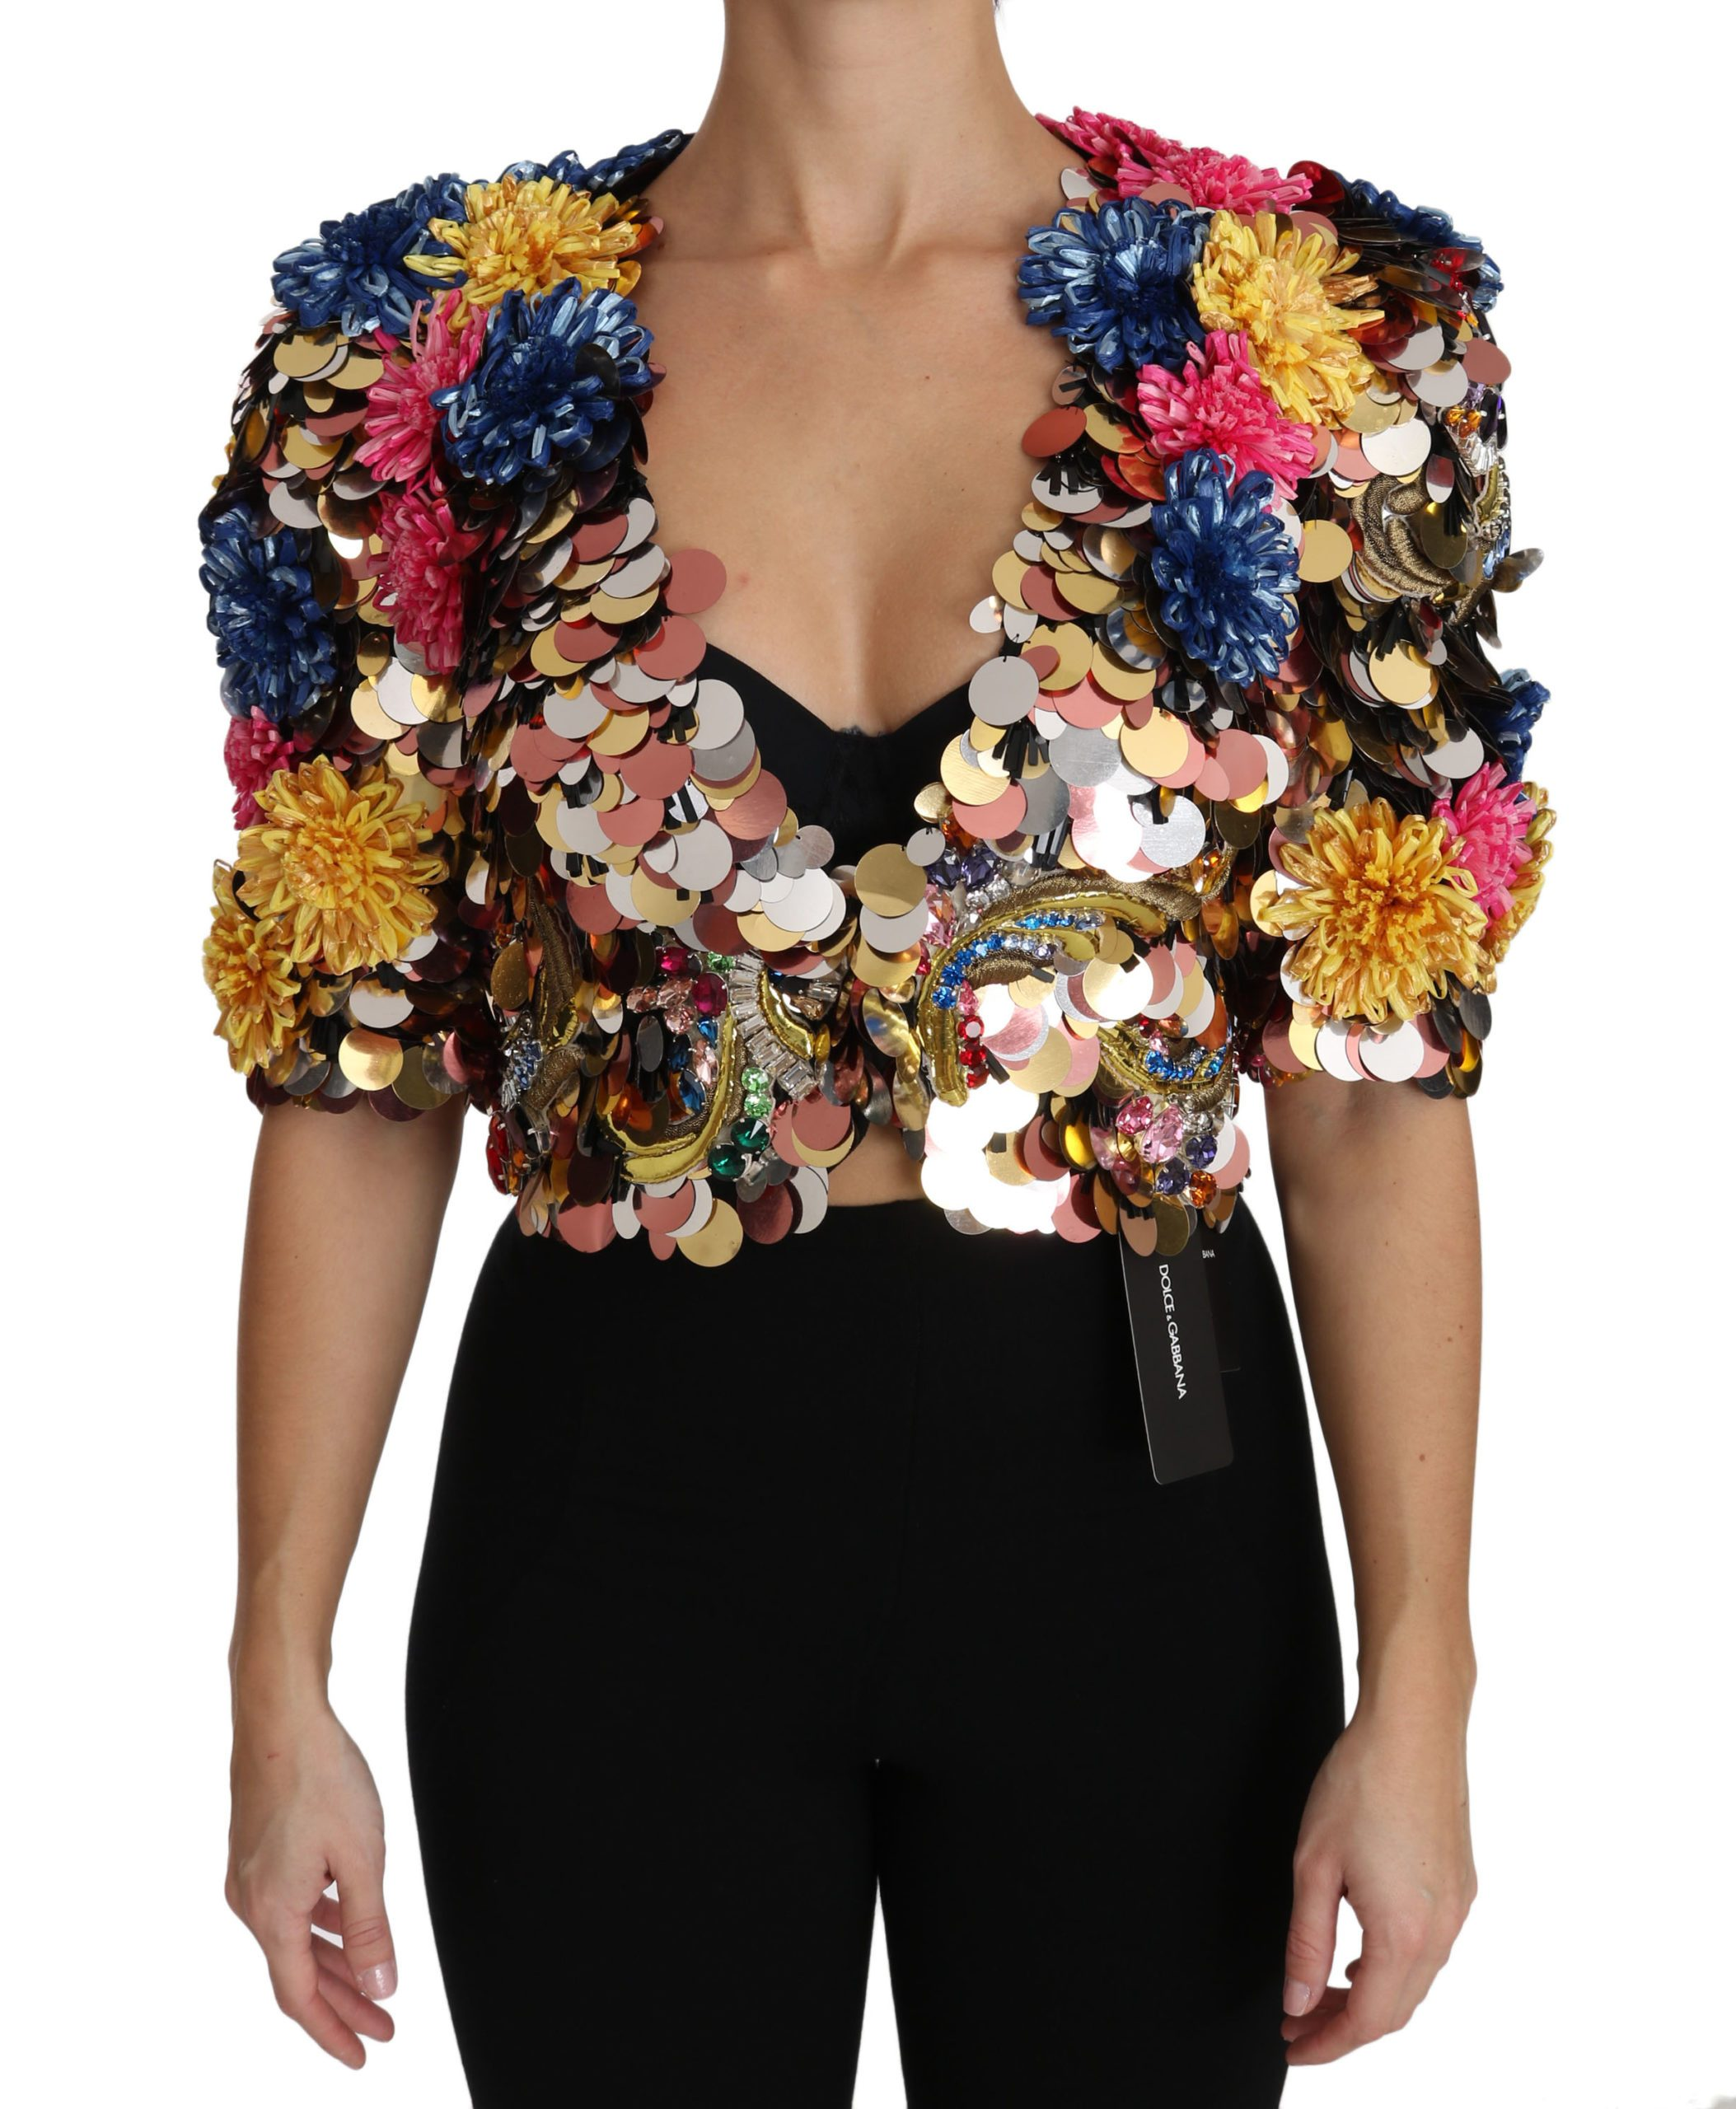 Dolce & Gabbana Women's Crystal Sequined Floral Coat Multicolor JKT2409 - IT36   XS